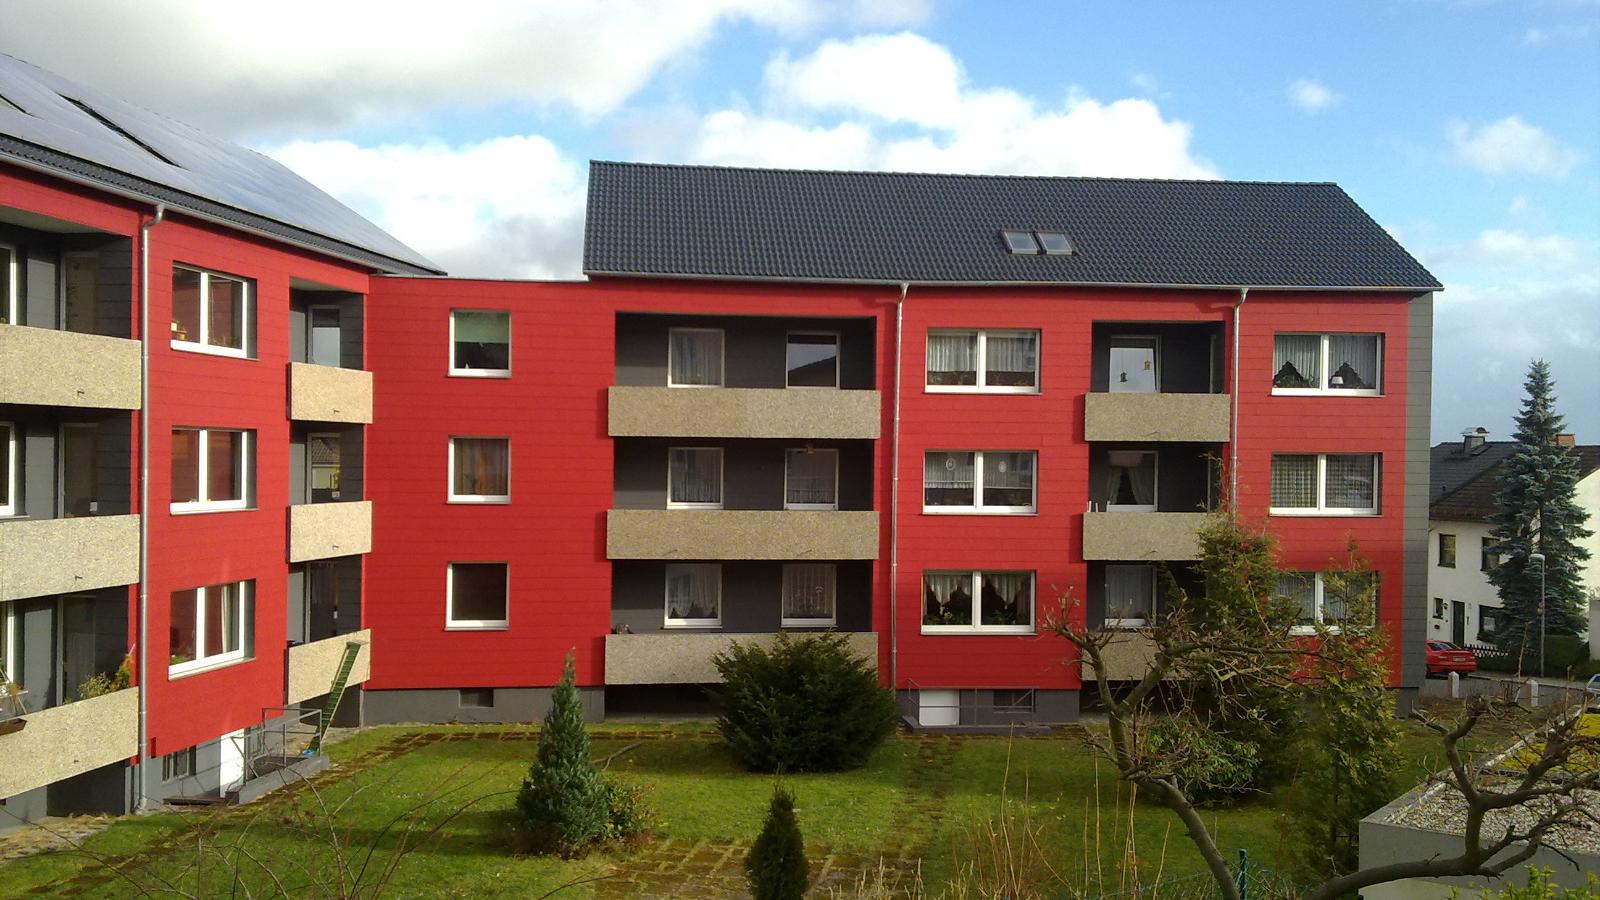 Mehrfamilienhaus Hof Am Breiten Rasen 32-36